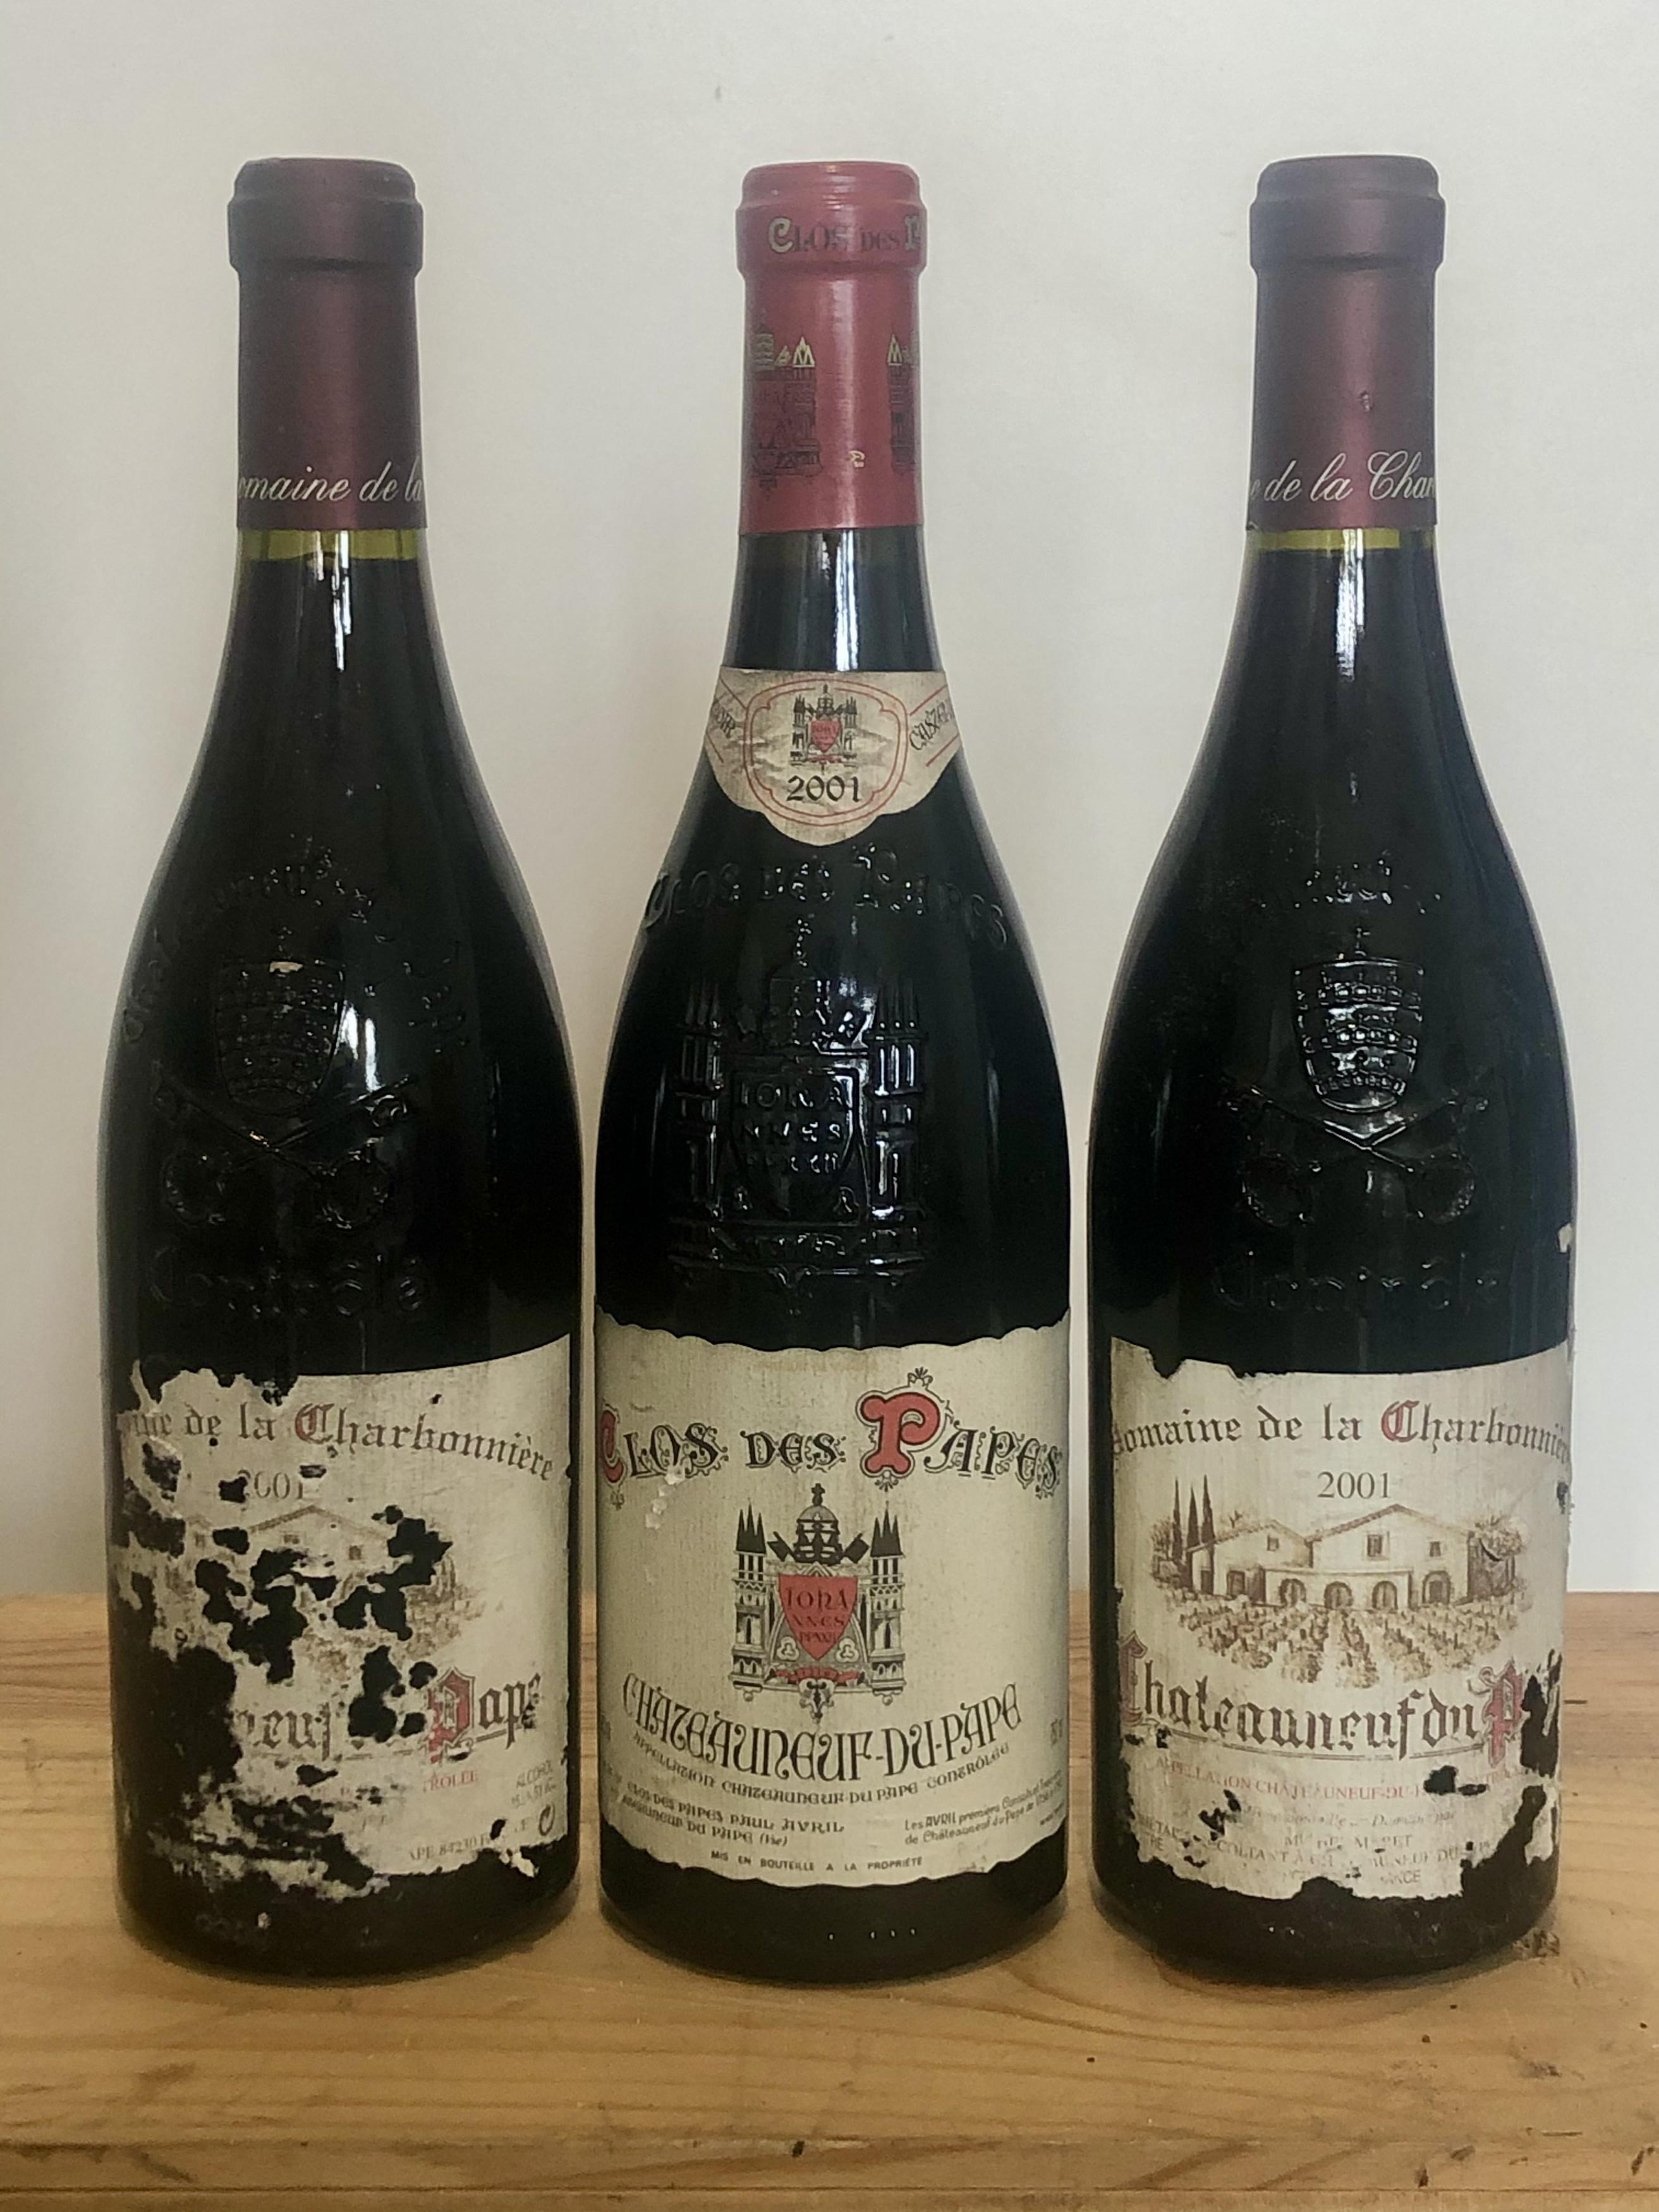 3 Bottles mixed Lot Fine 2001 Chateauneuf du Pape